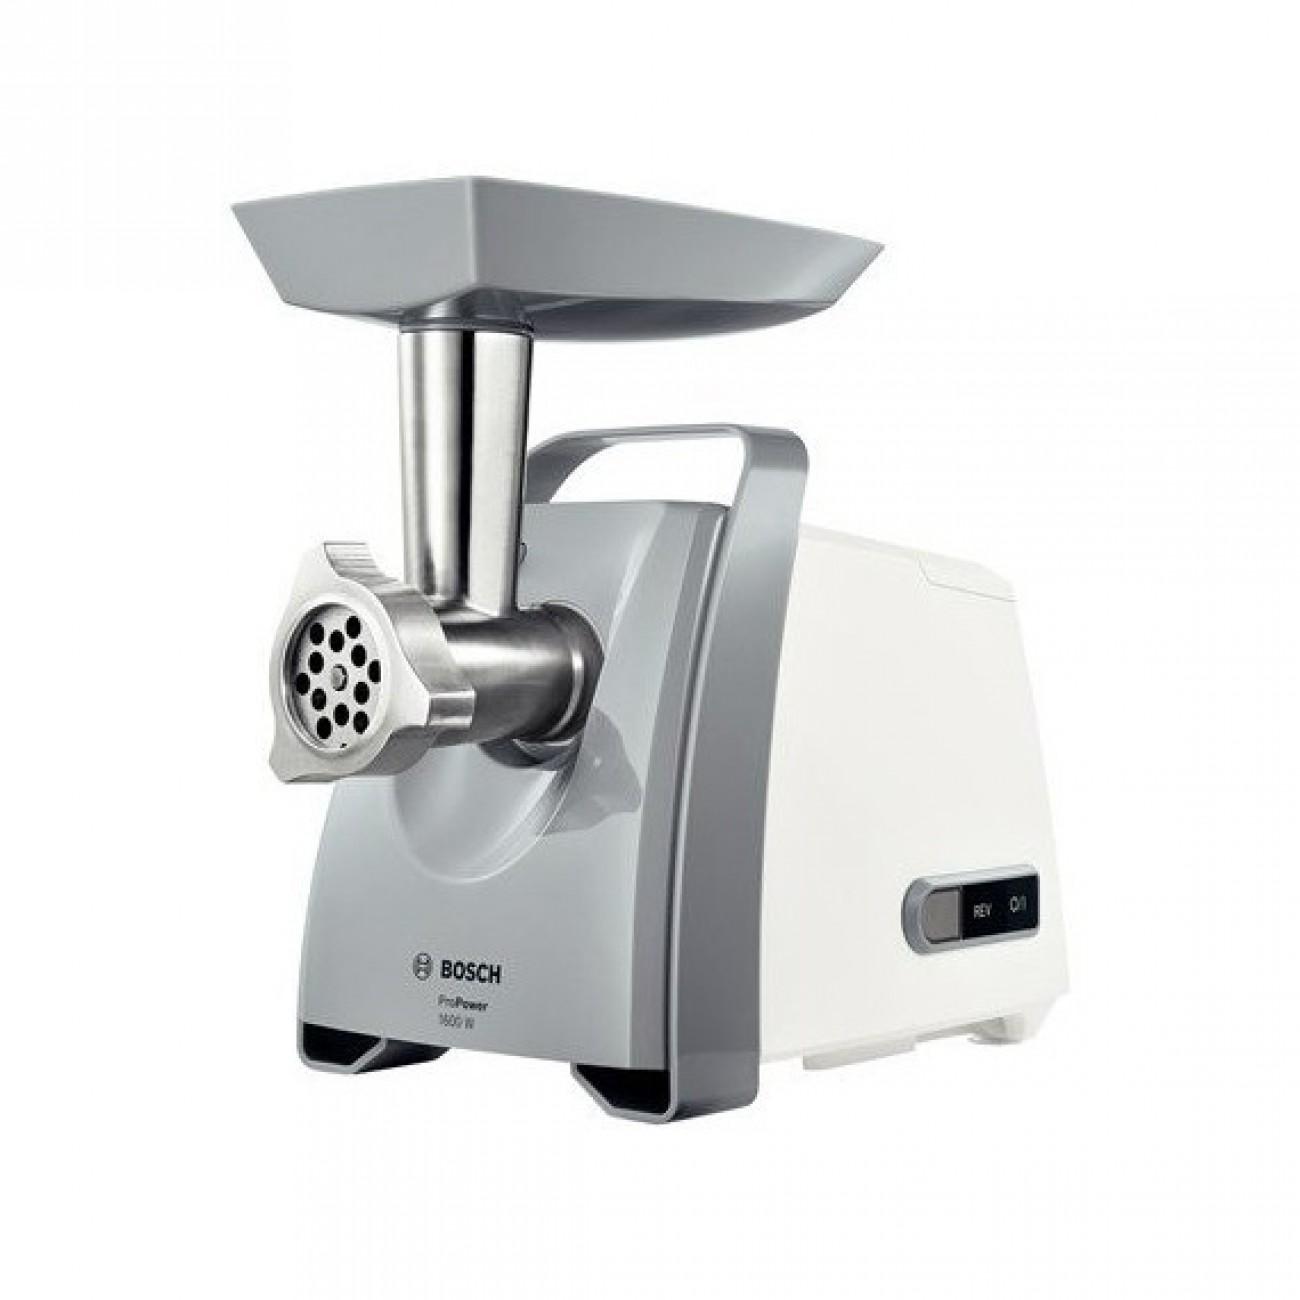 Месомелачка Bosch MFW45020 в Месомелачки - Bosсh | Alleop